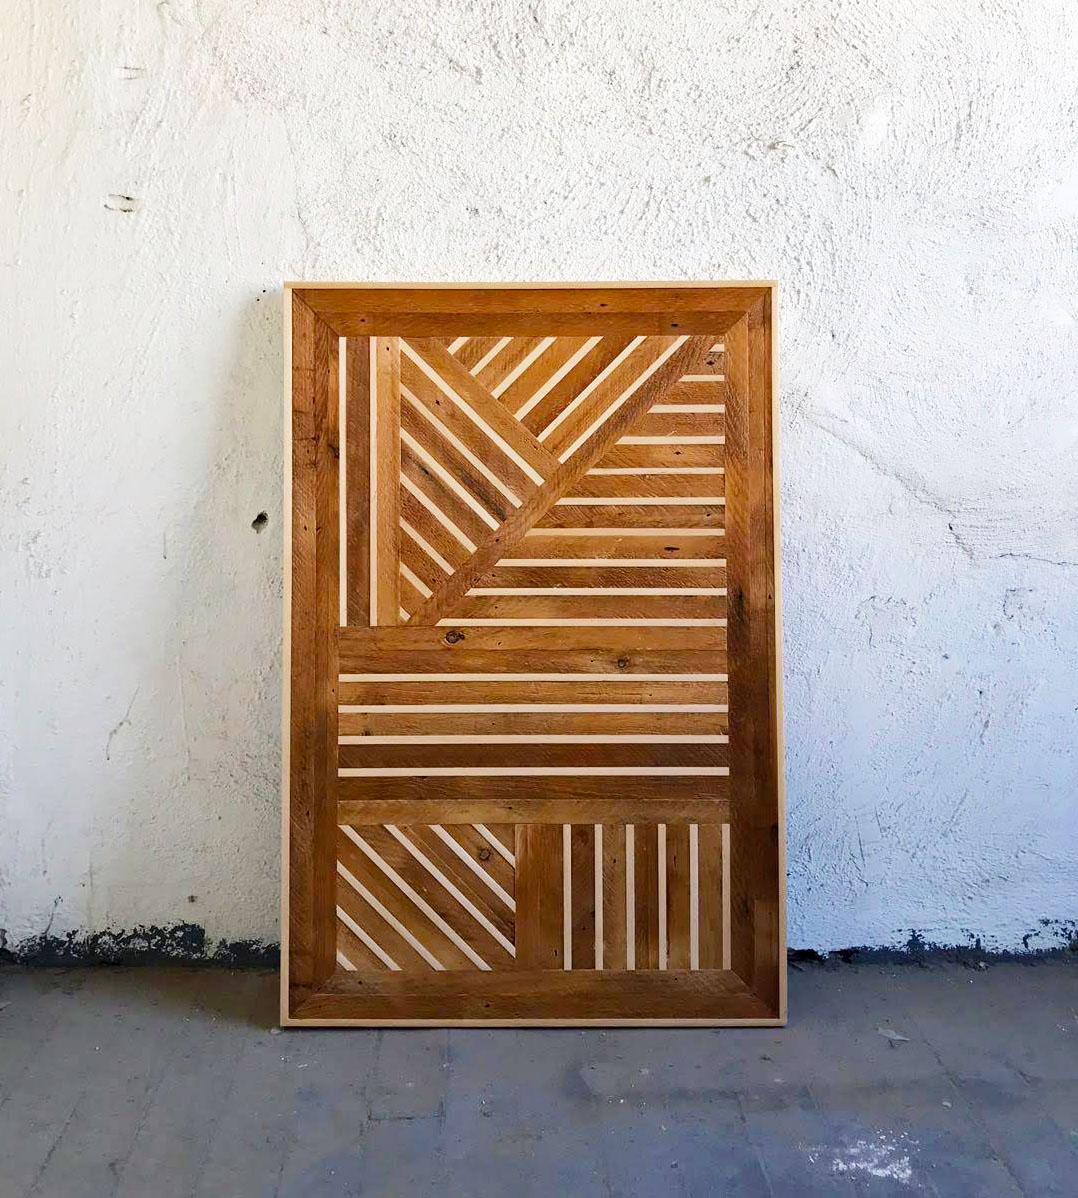 Untitled II   Wood   36 3/4 x 24 3/4 in